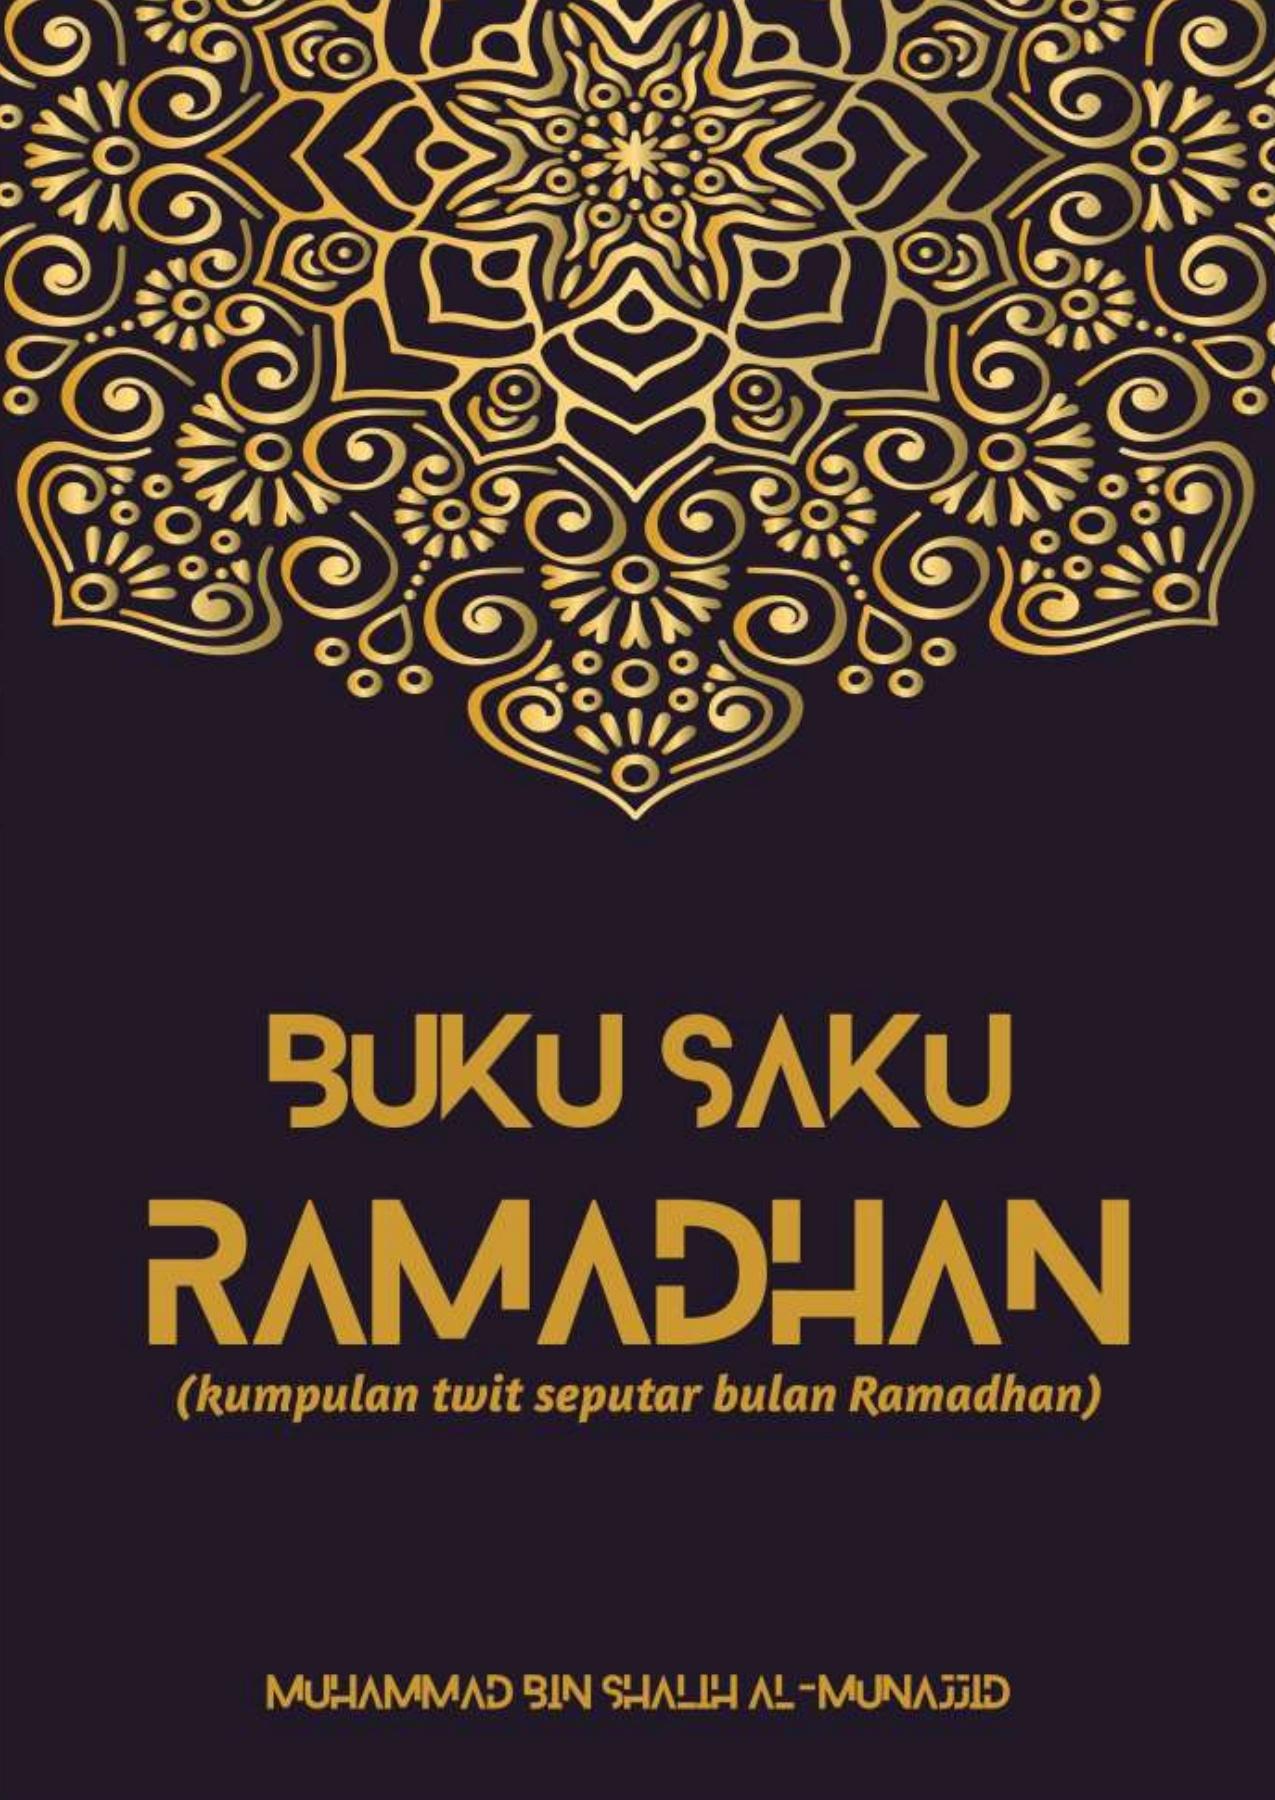 Mimpi Basah Di Siang Hari Pada Bulan Ramadhan : mimpi, basah, siang, bulan, ramadhan, Kecil, Ramadhan-Flip, EBook, Pages, AnyFlip